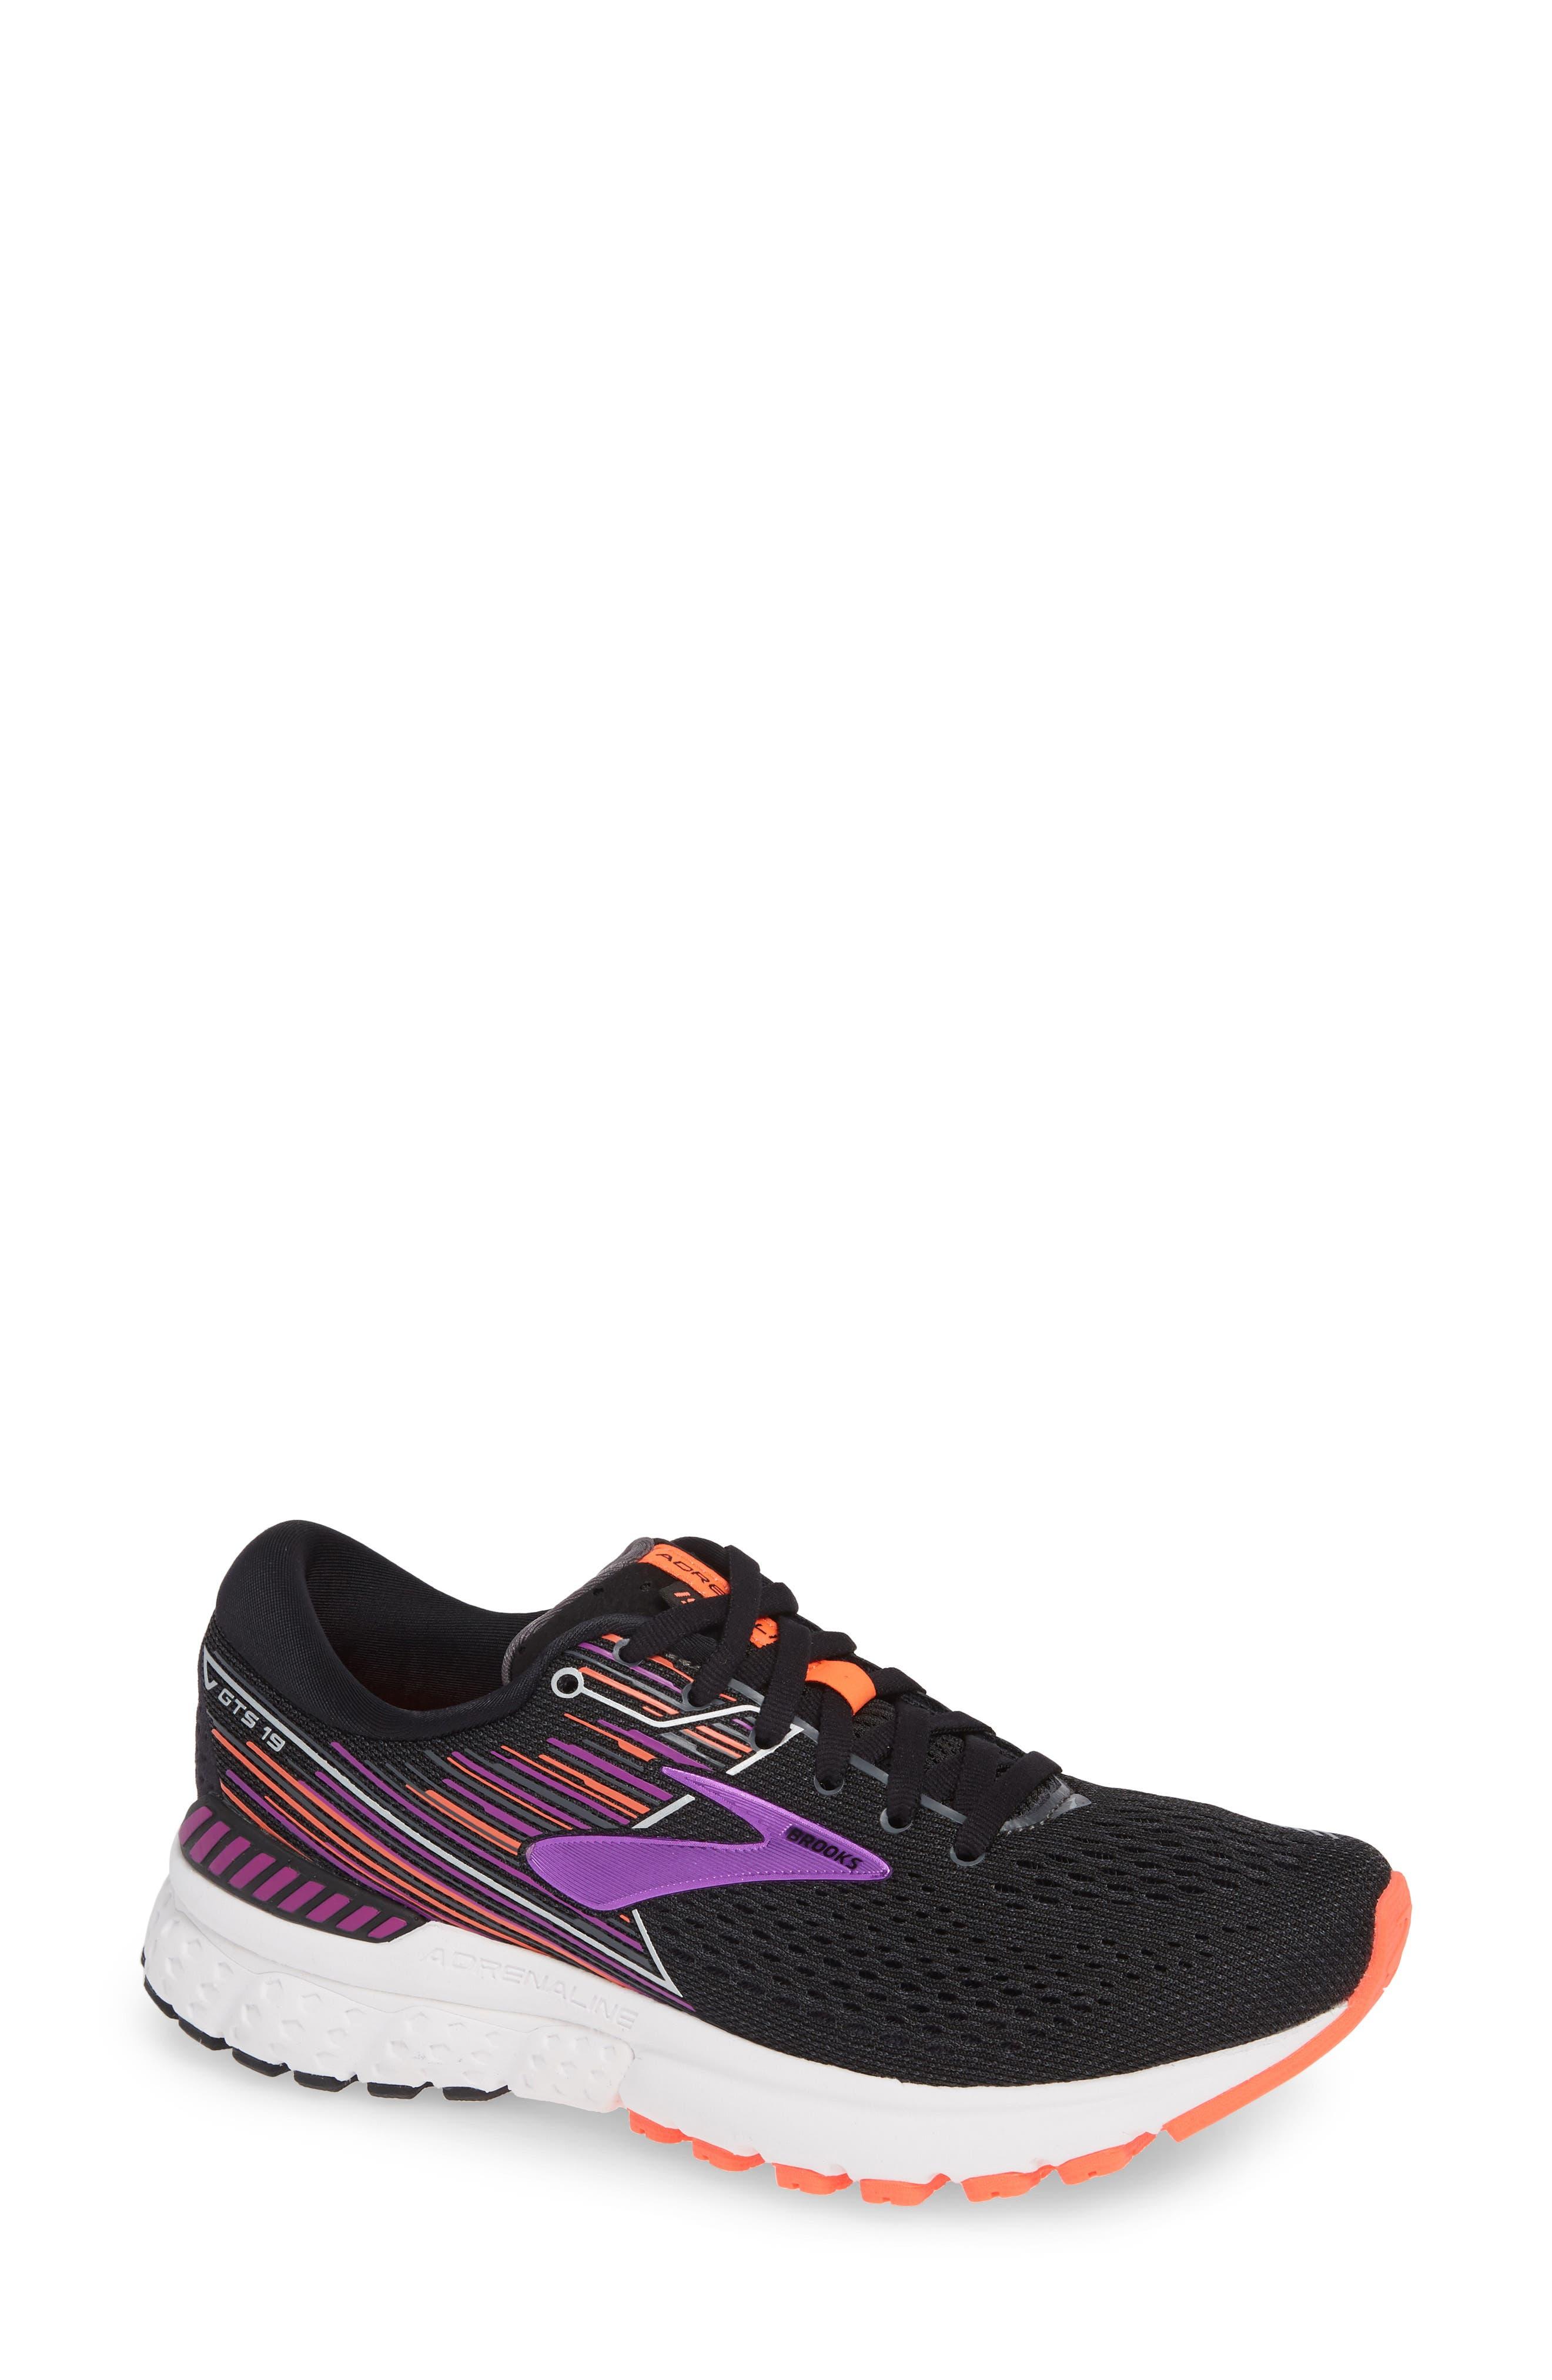 Adrenaline GTS 19 Running Shoe,                             Main thumbnail 1, color,                             BLACK/ PURPLE/ CORAL